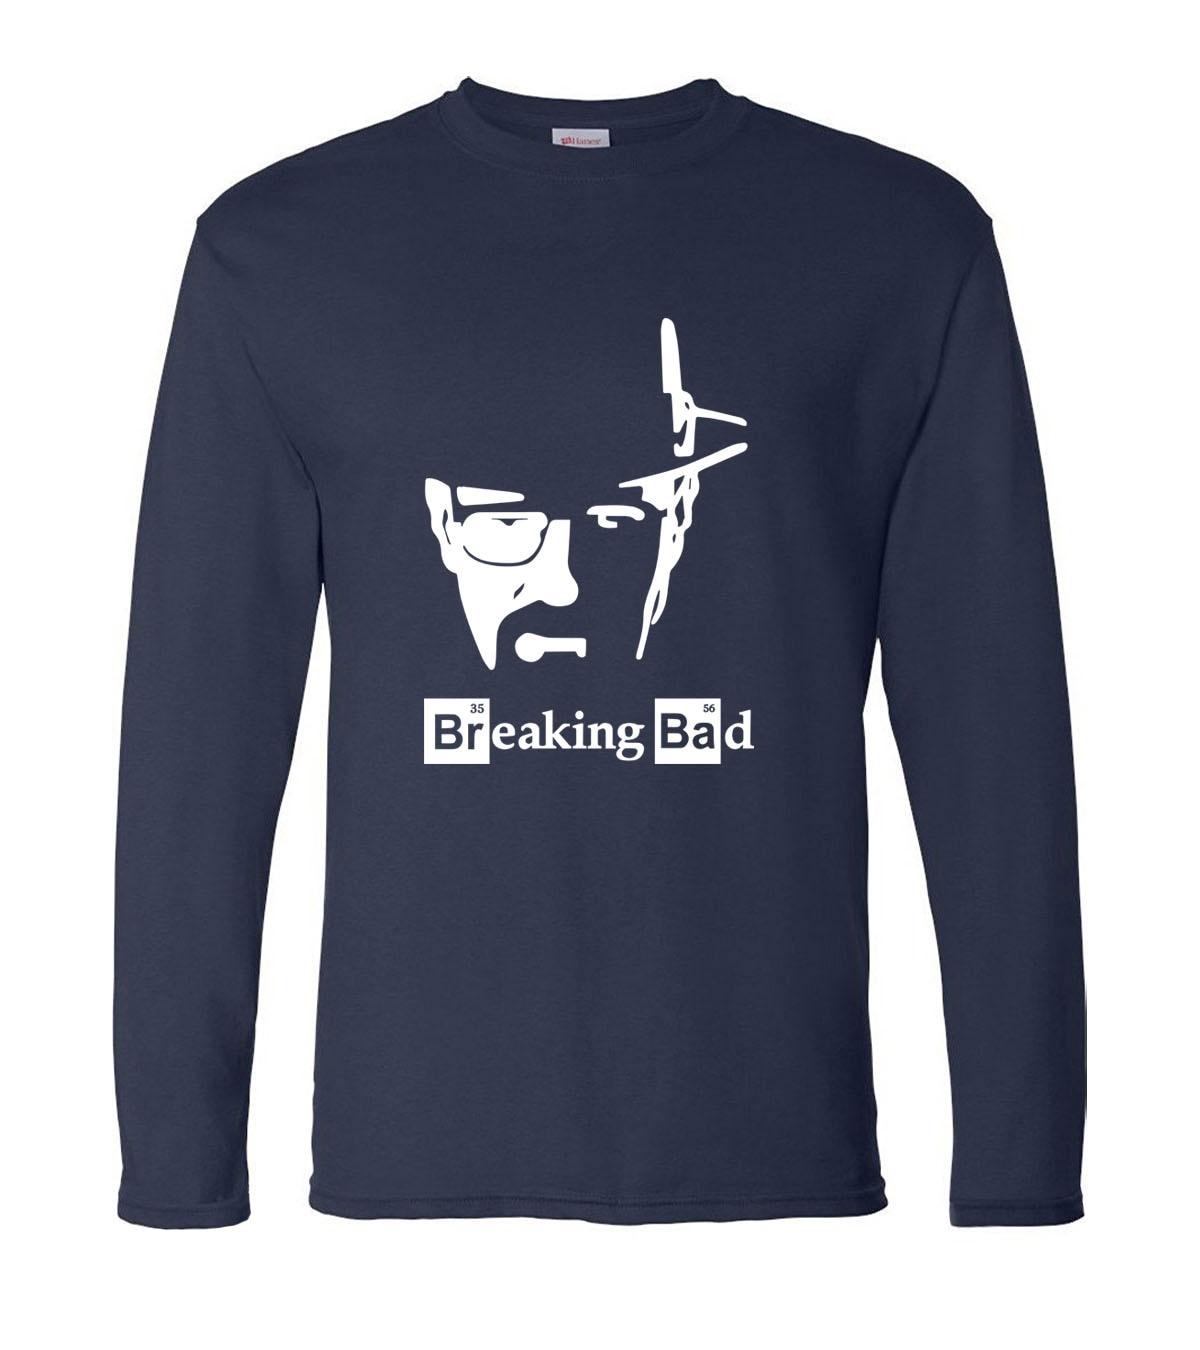 Camiseta de manga larga para hombre de Breaking Bad Heisenberg, Camiseta de algodón para hombre de primavera 100% 2019